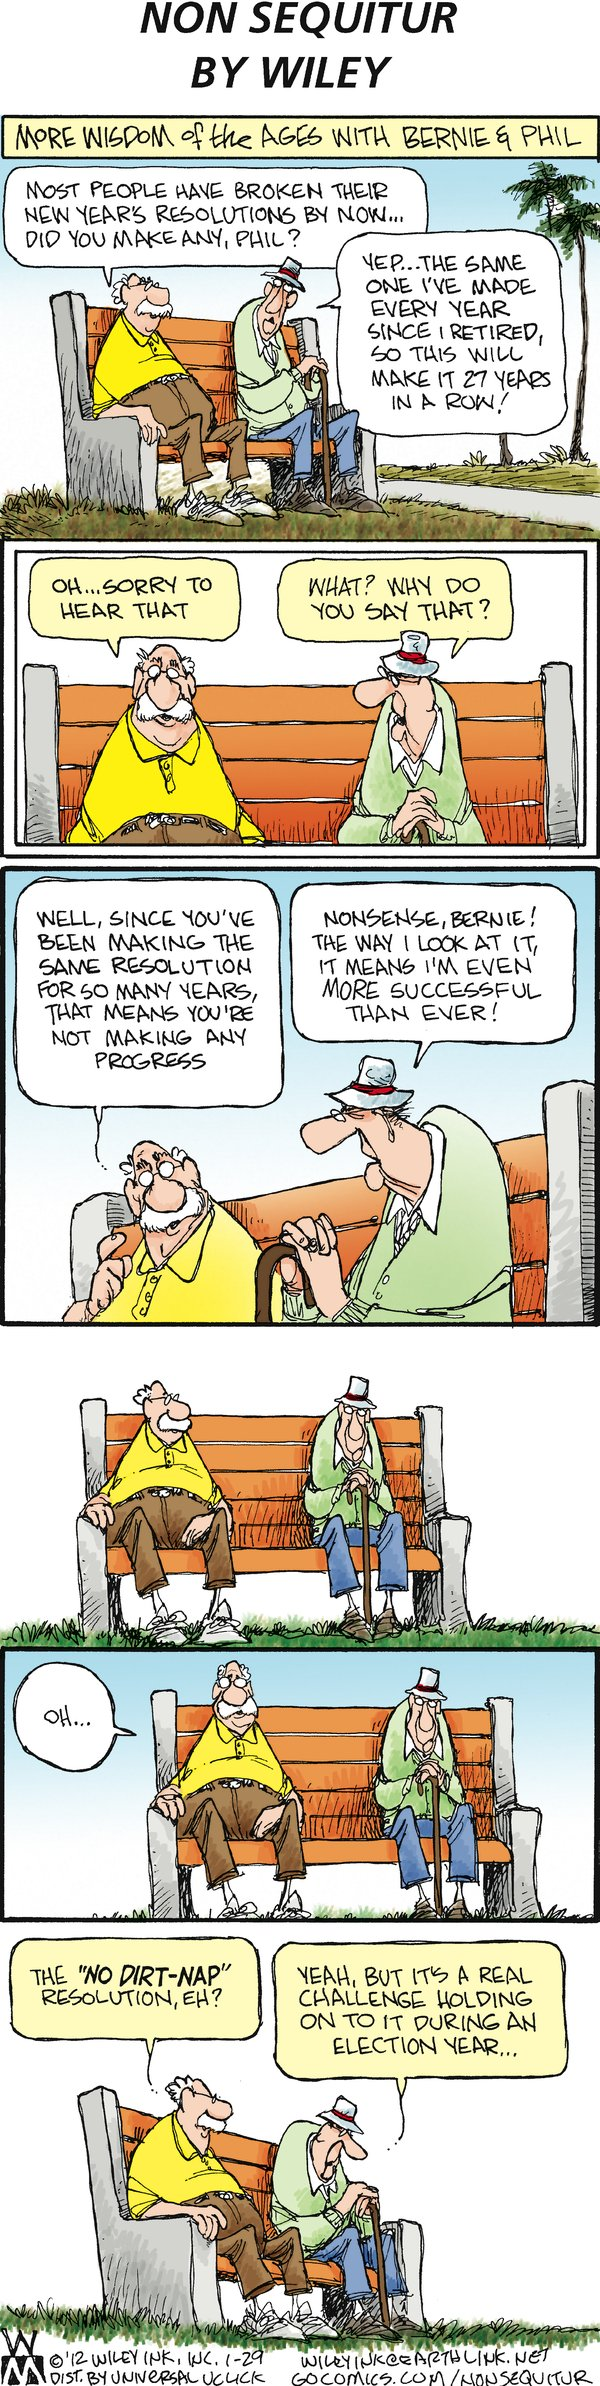 Non Sequitur for Jan 29, 2012 Comic Strip